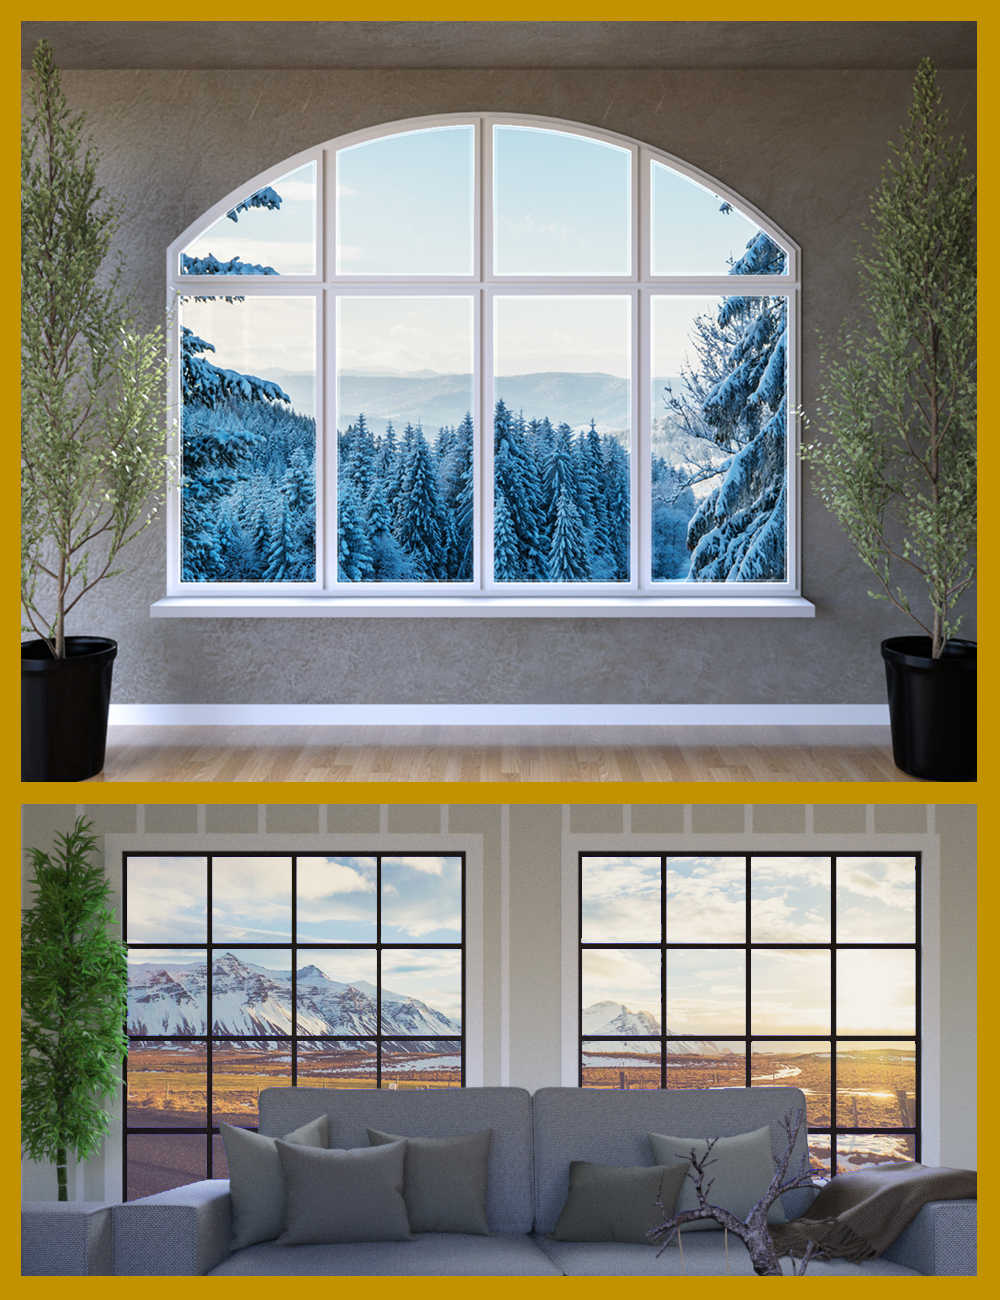 WinterScapes Backdrops Volume 2 by: IlluminationImagineX, 3D Models by Daz 3D